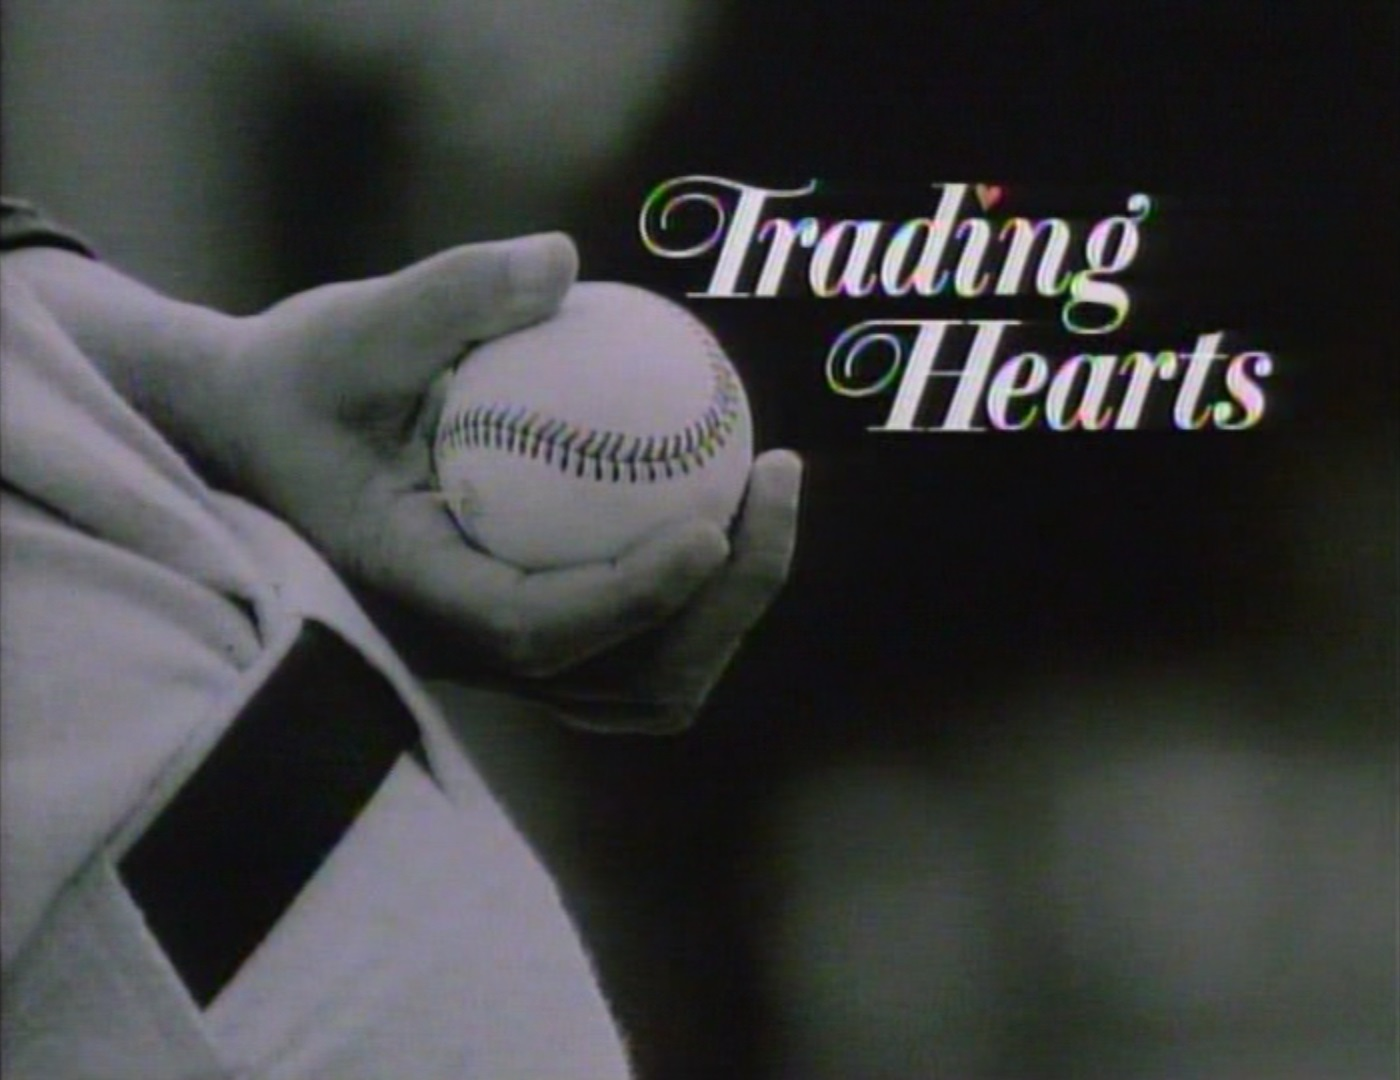 Trading Hearts.jpg